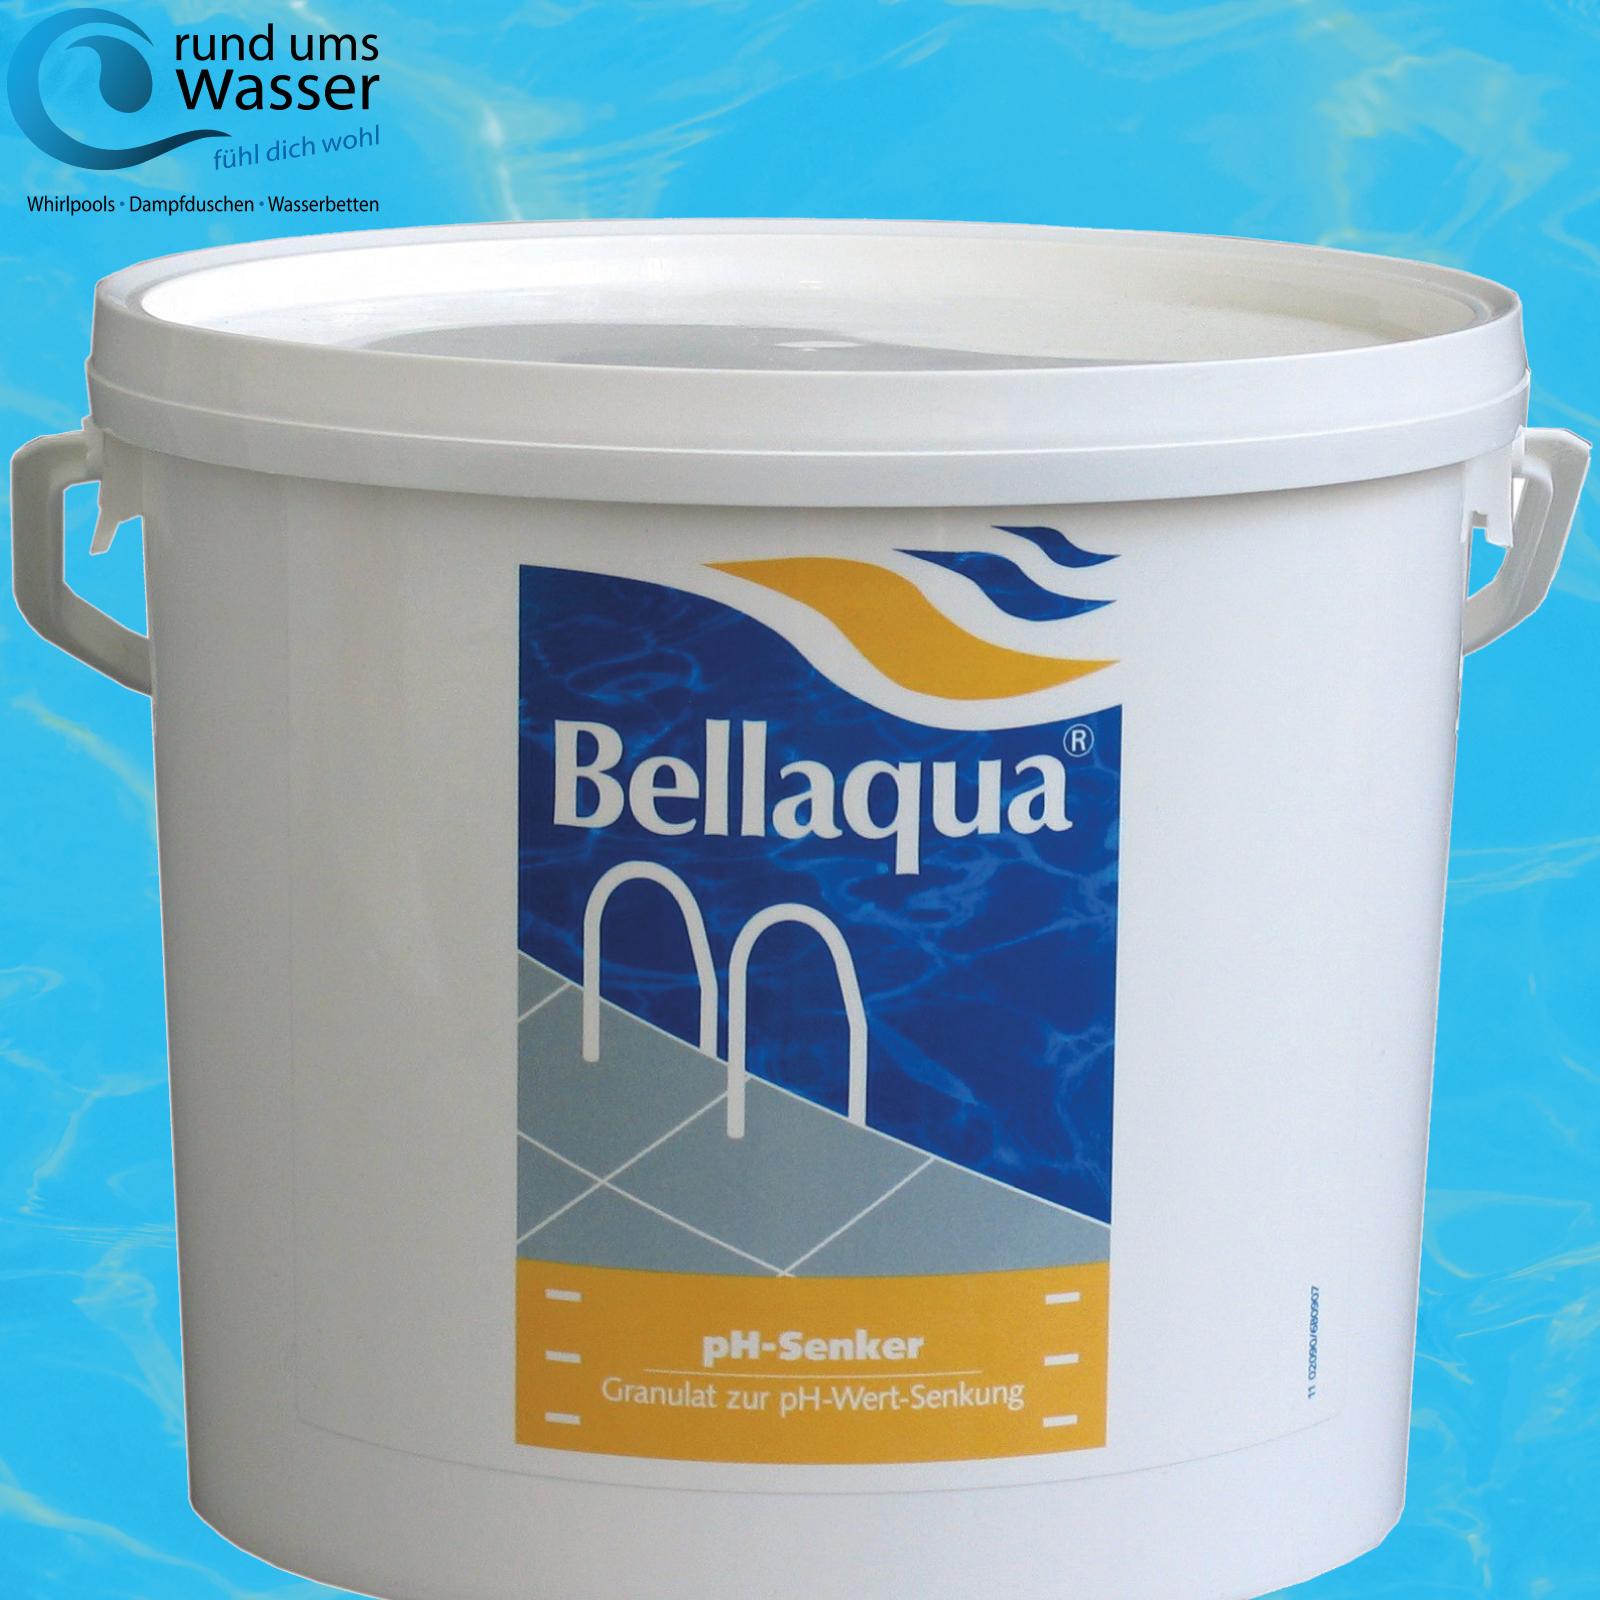 bellaqua ph senker 6kg ph minus pool schwimmbad ph wert regulierung bayrol ebay. Black Bedroom Furniture Sets. Home Design Ideas